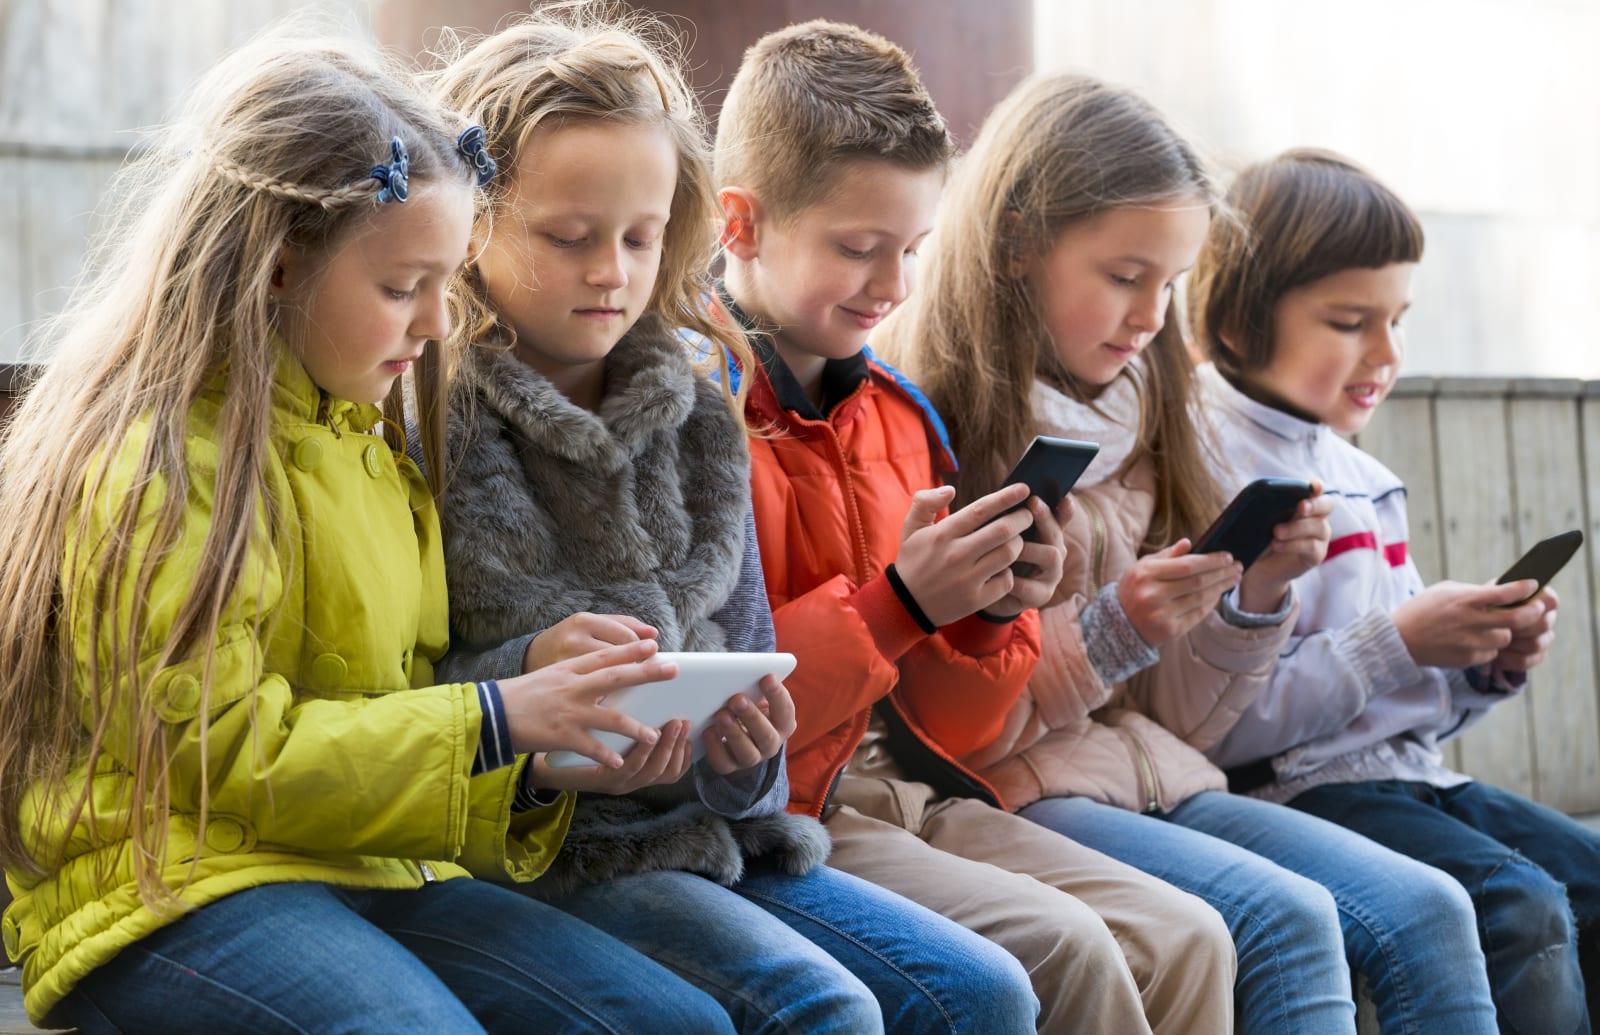 Image result for children social media addiction